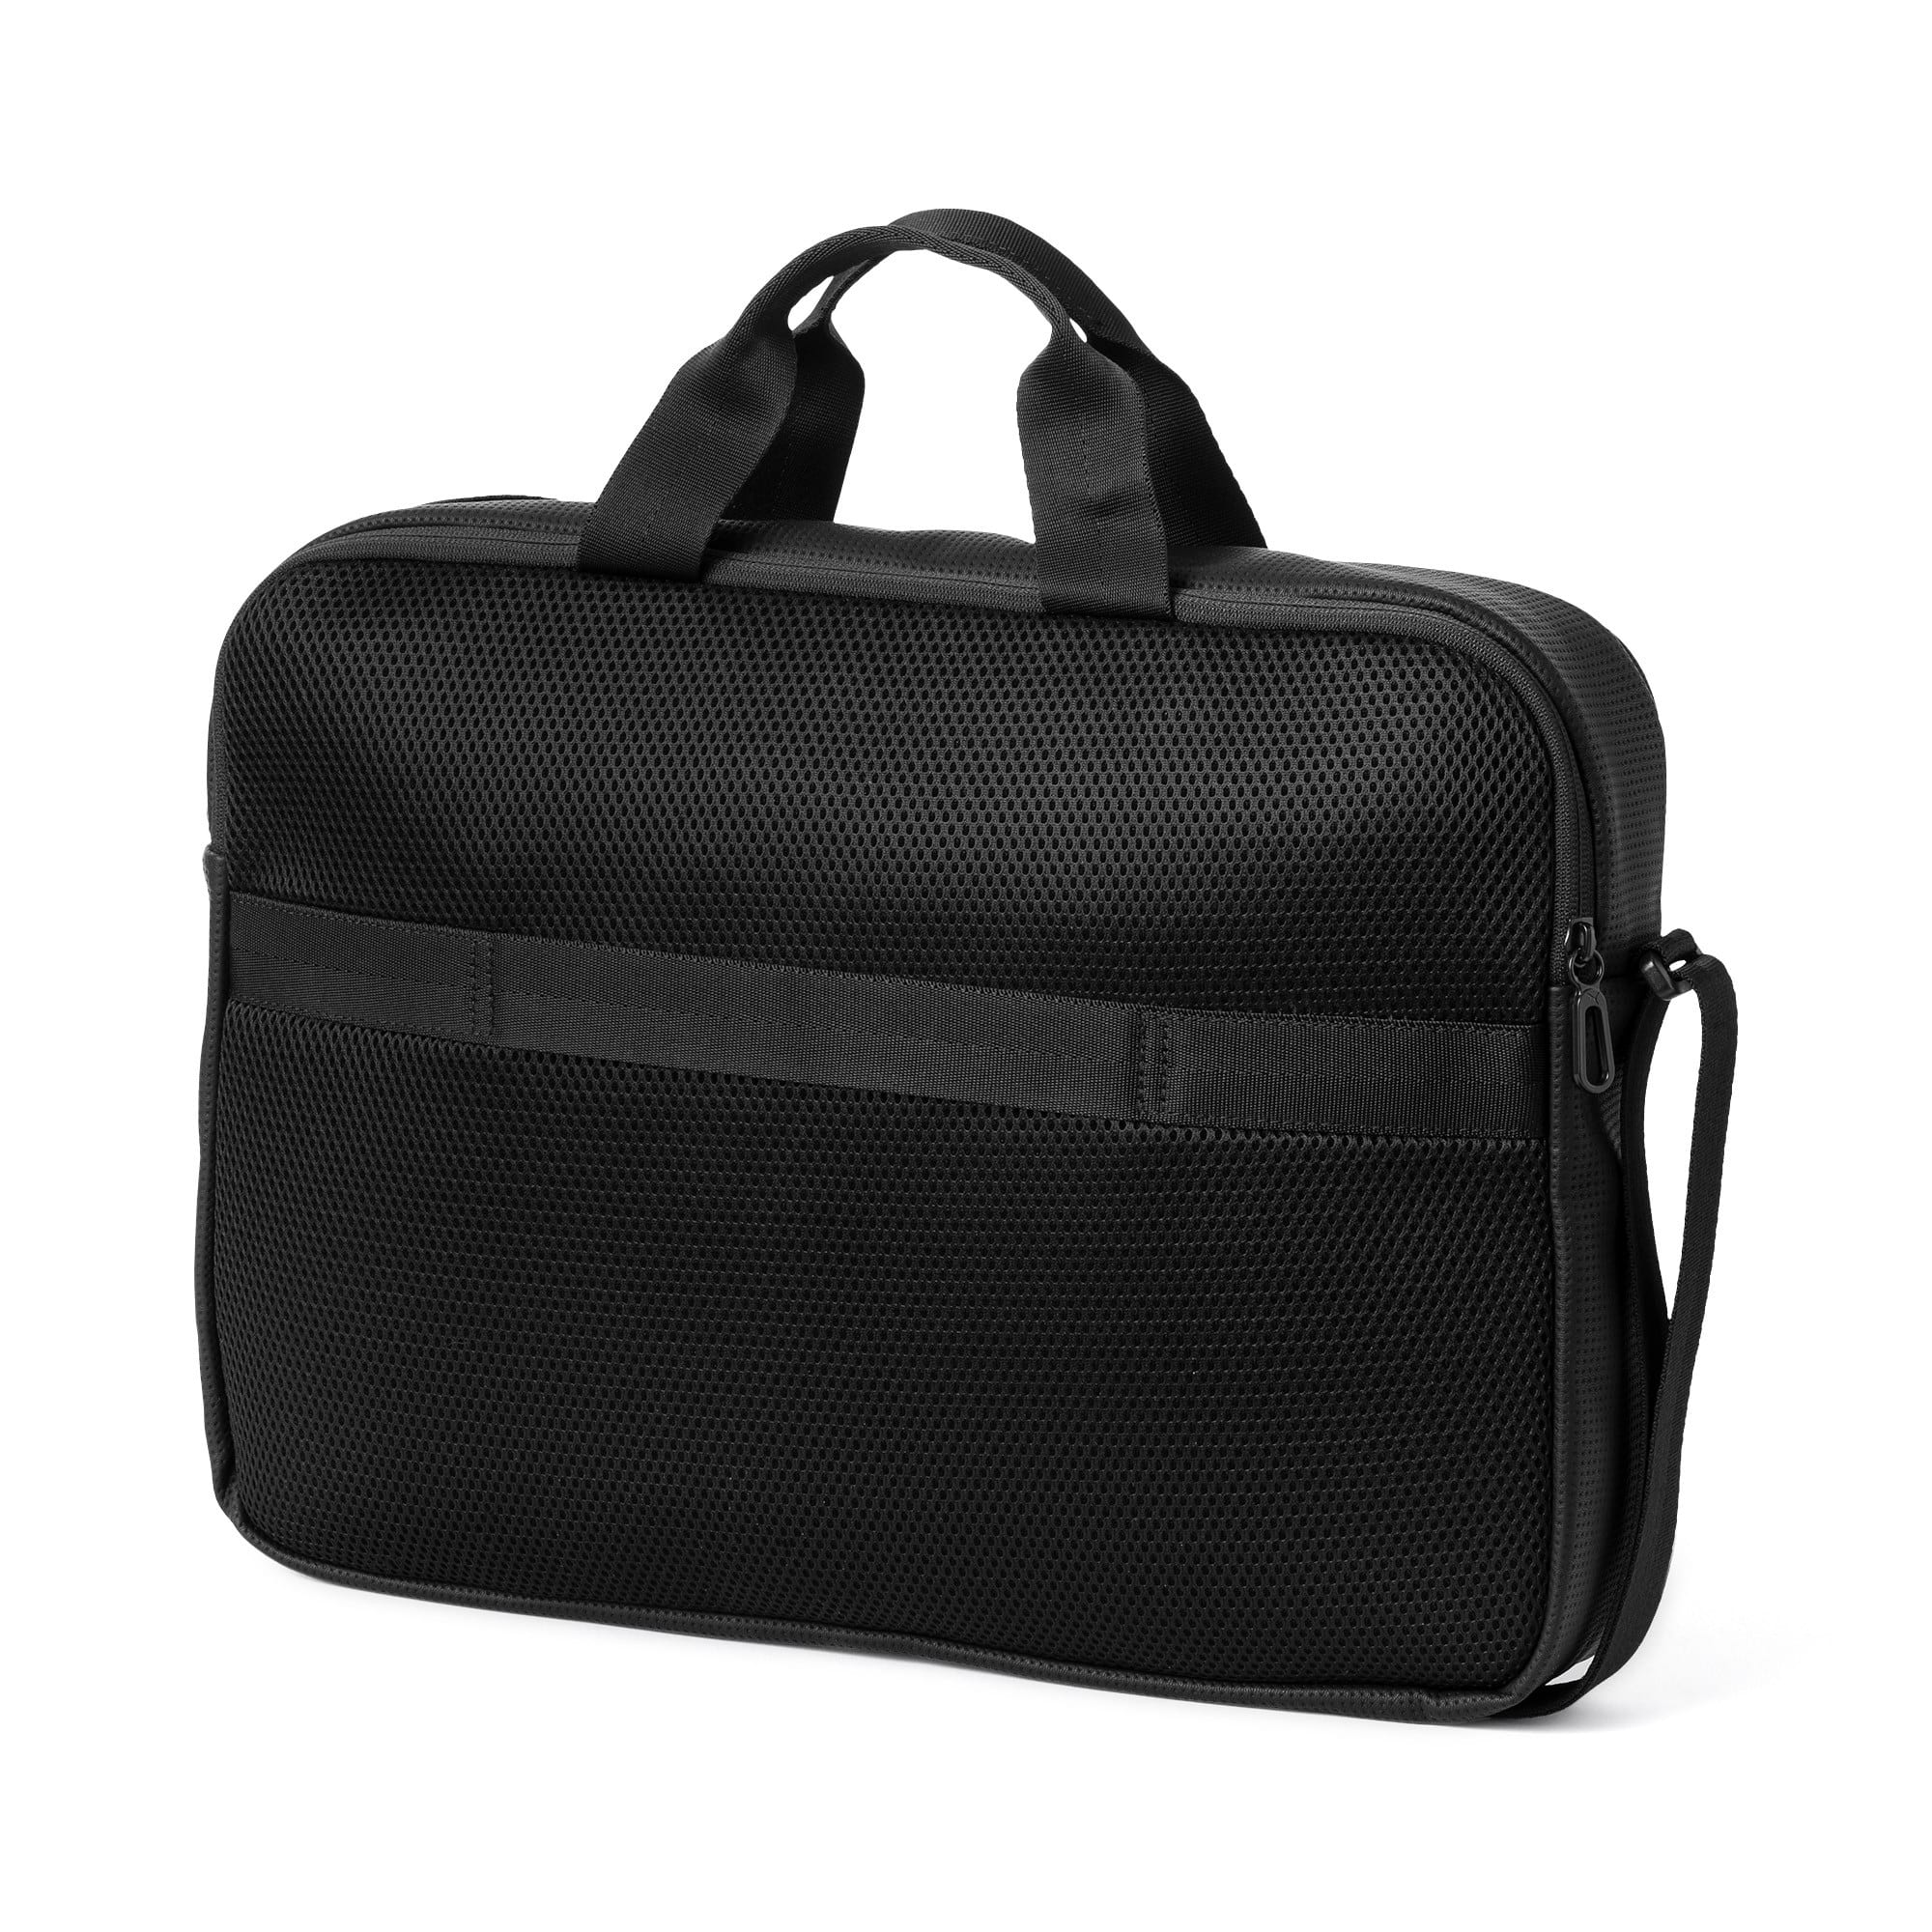 Thumbnail 3 of Ferrari Lifestyle Reporter Bag, Puma Black, medium-IND